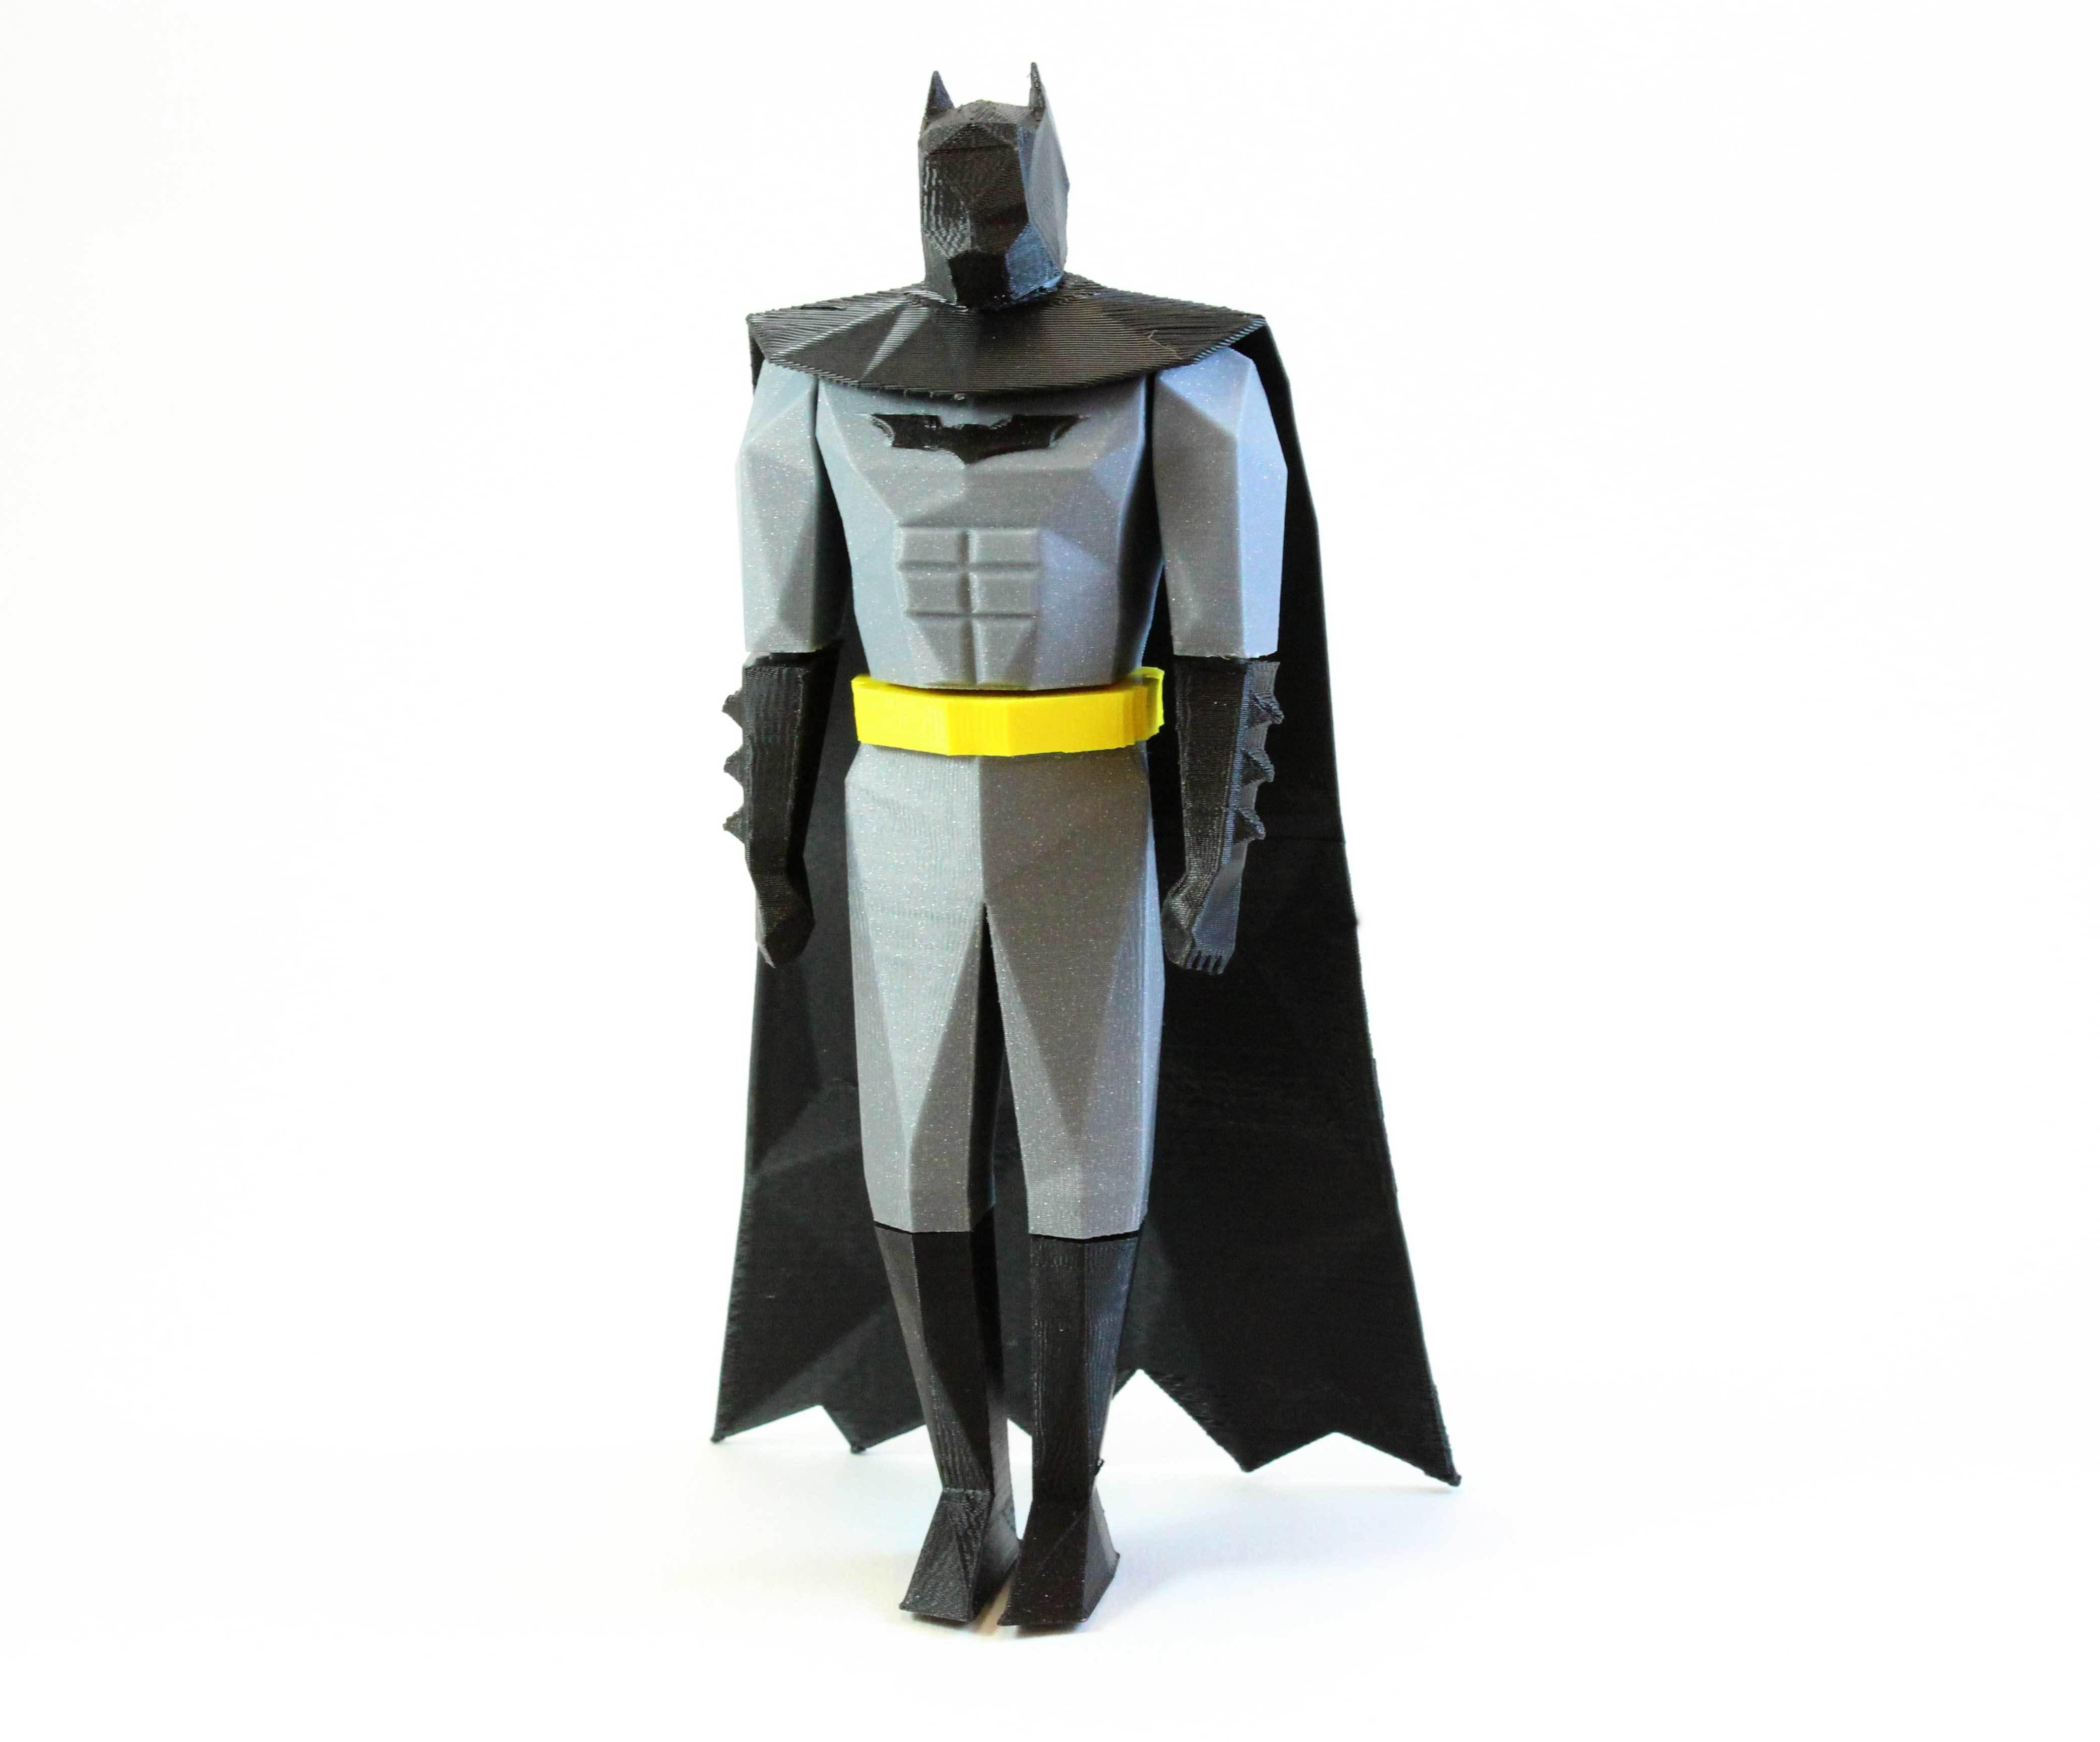 3D Printed Batman Low Poly by christos_fragoulias | Pinshape